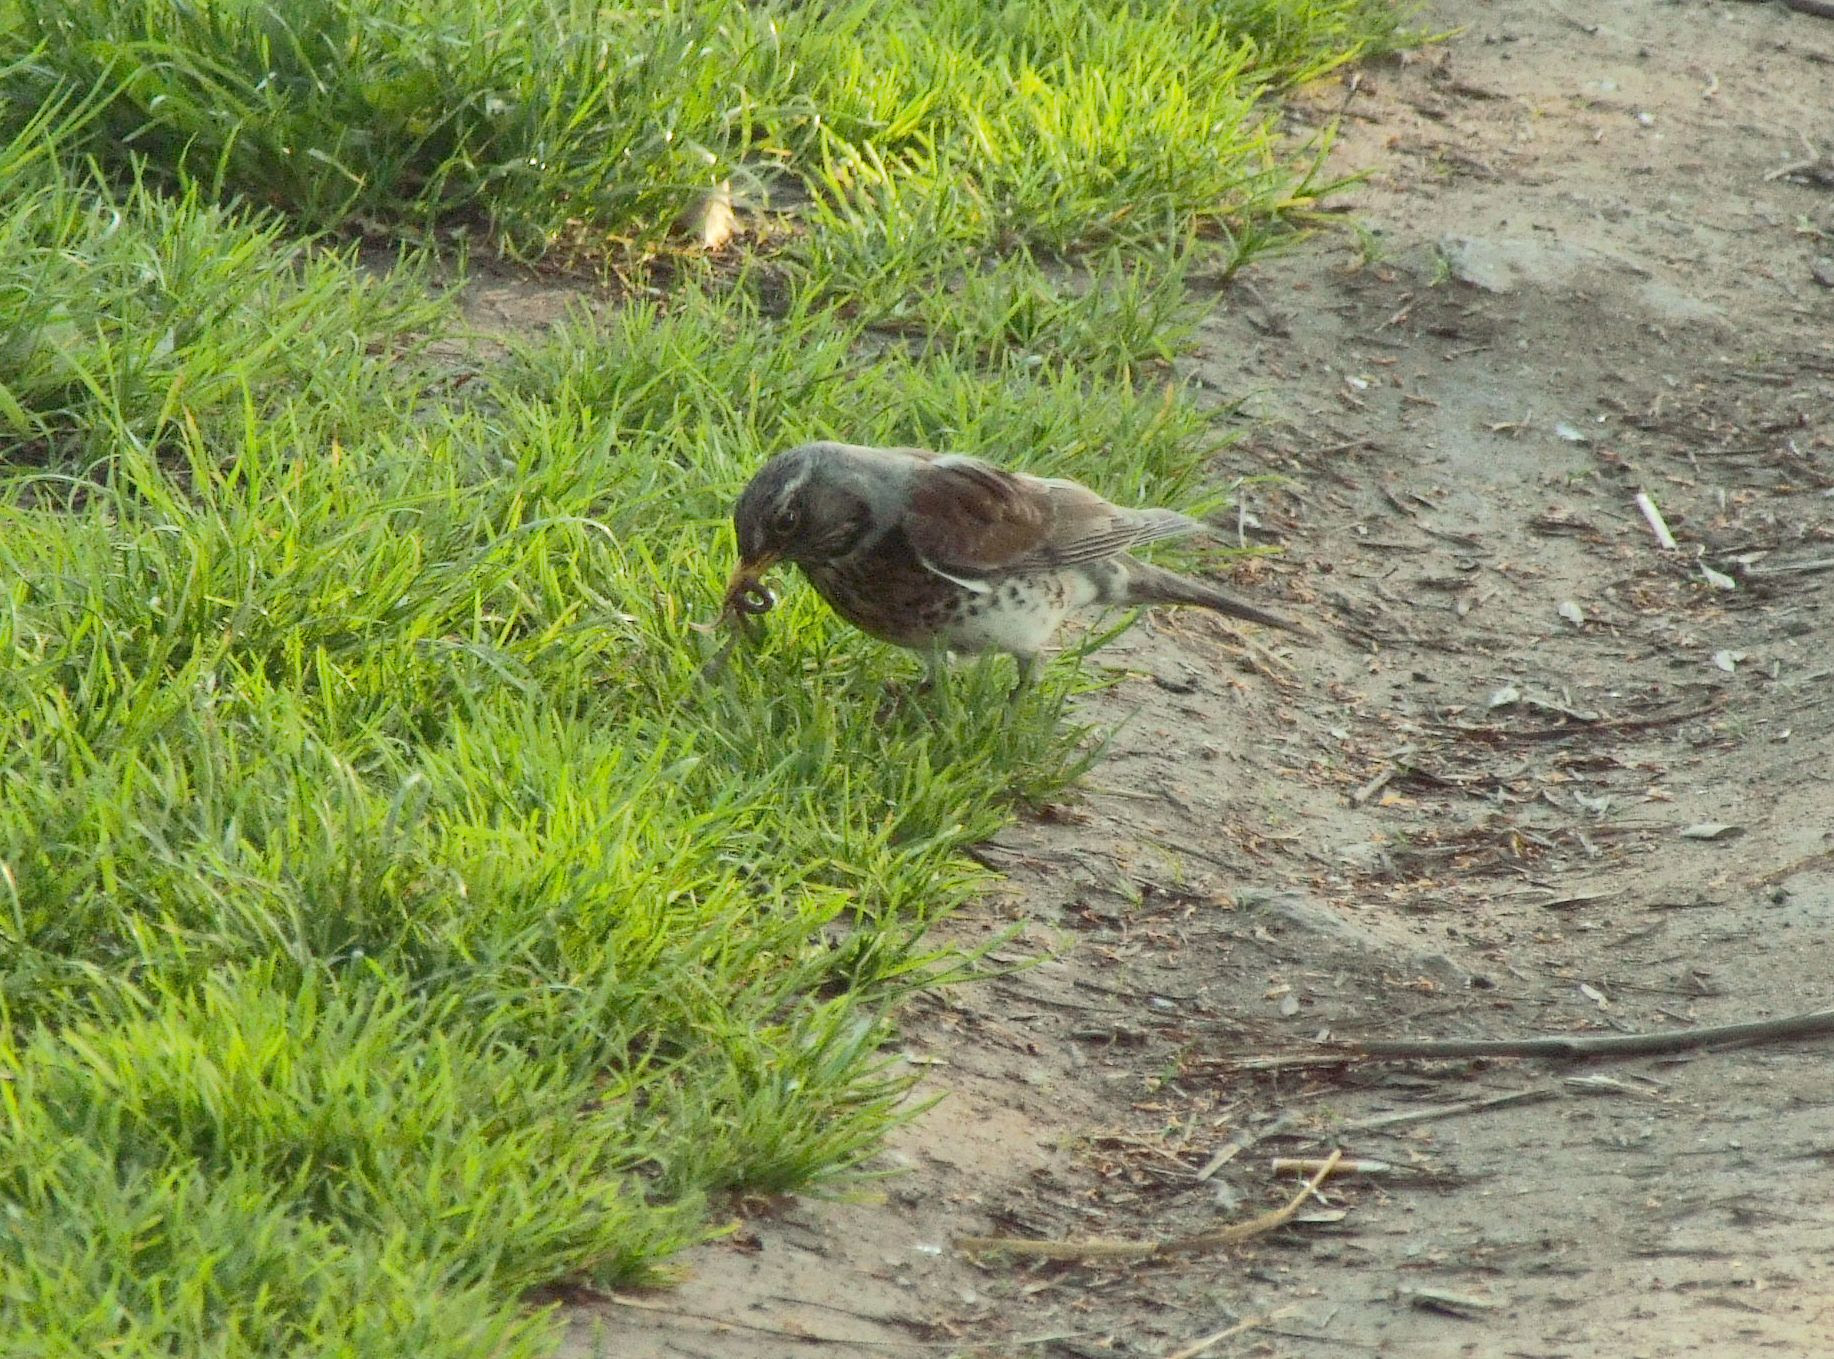 A bird capturing worm